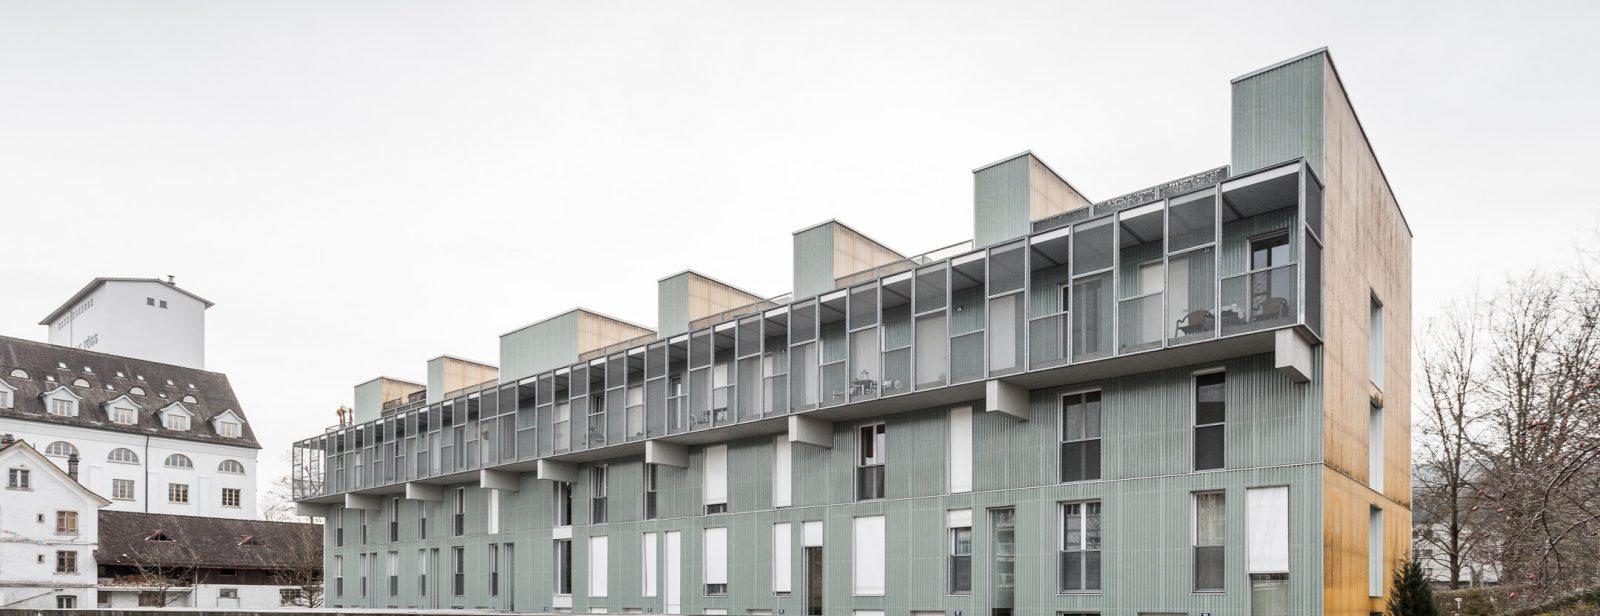 MFH Neumühlestrasse, Winterthur